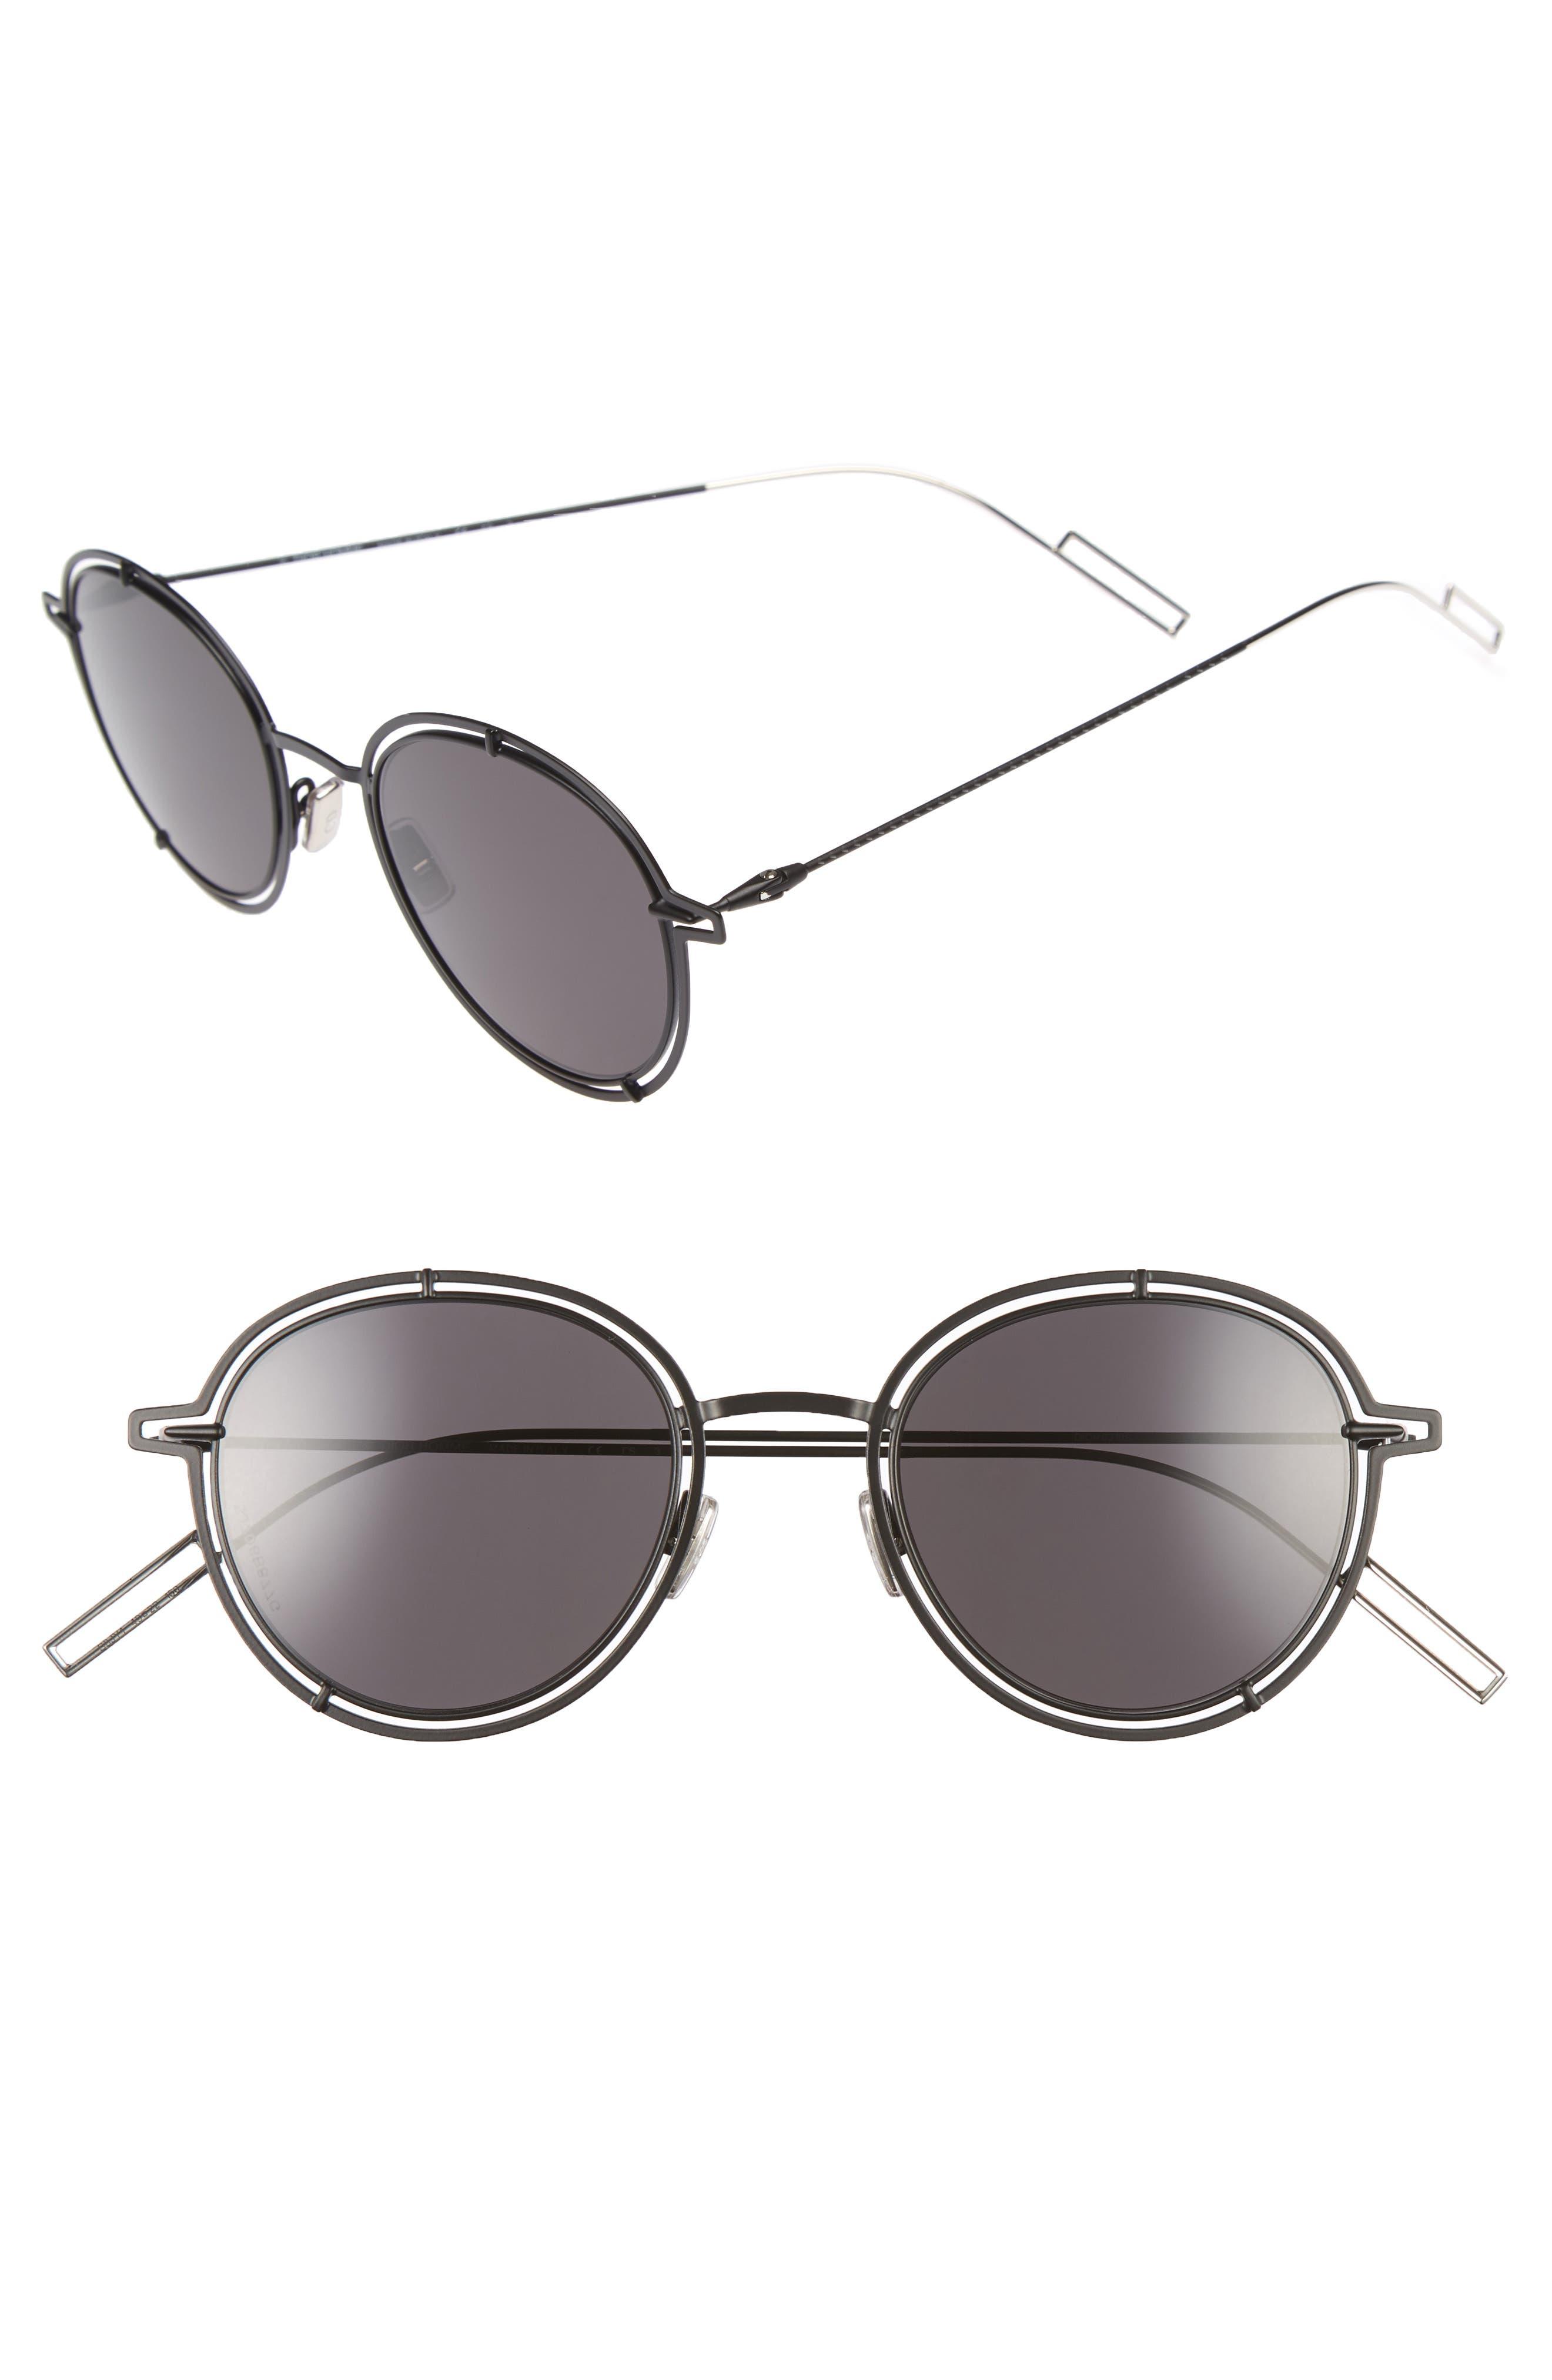 49mm Round Sunglasses,                         Main,                         color,